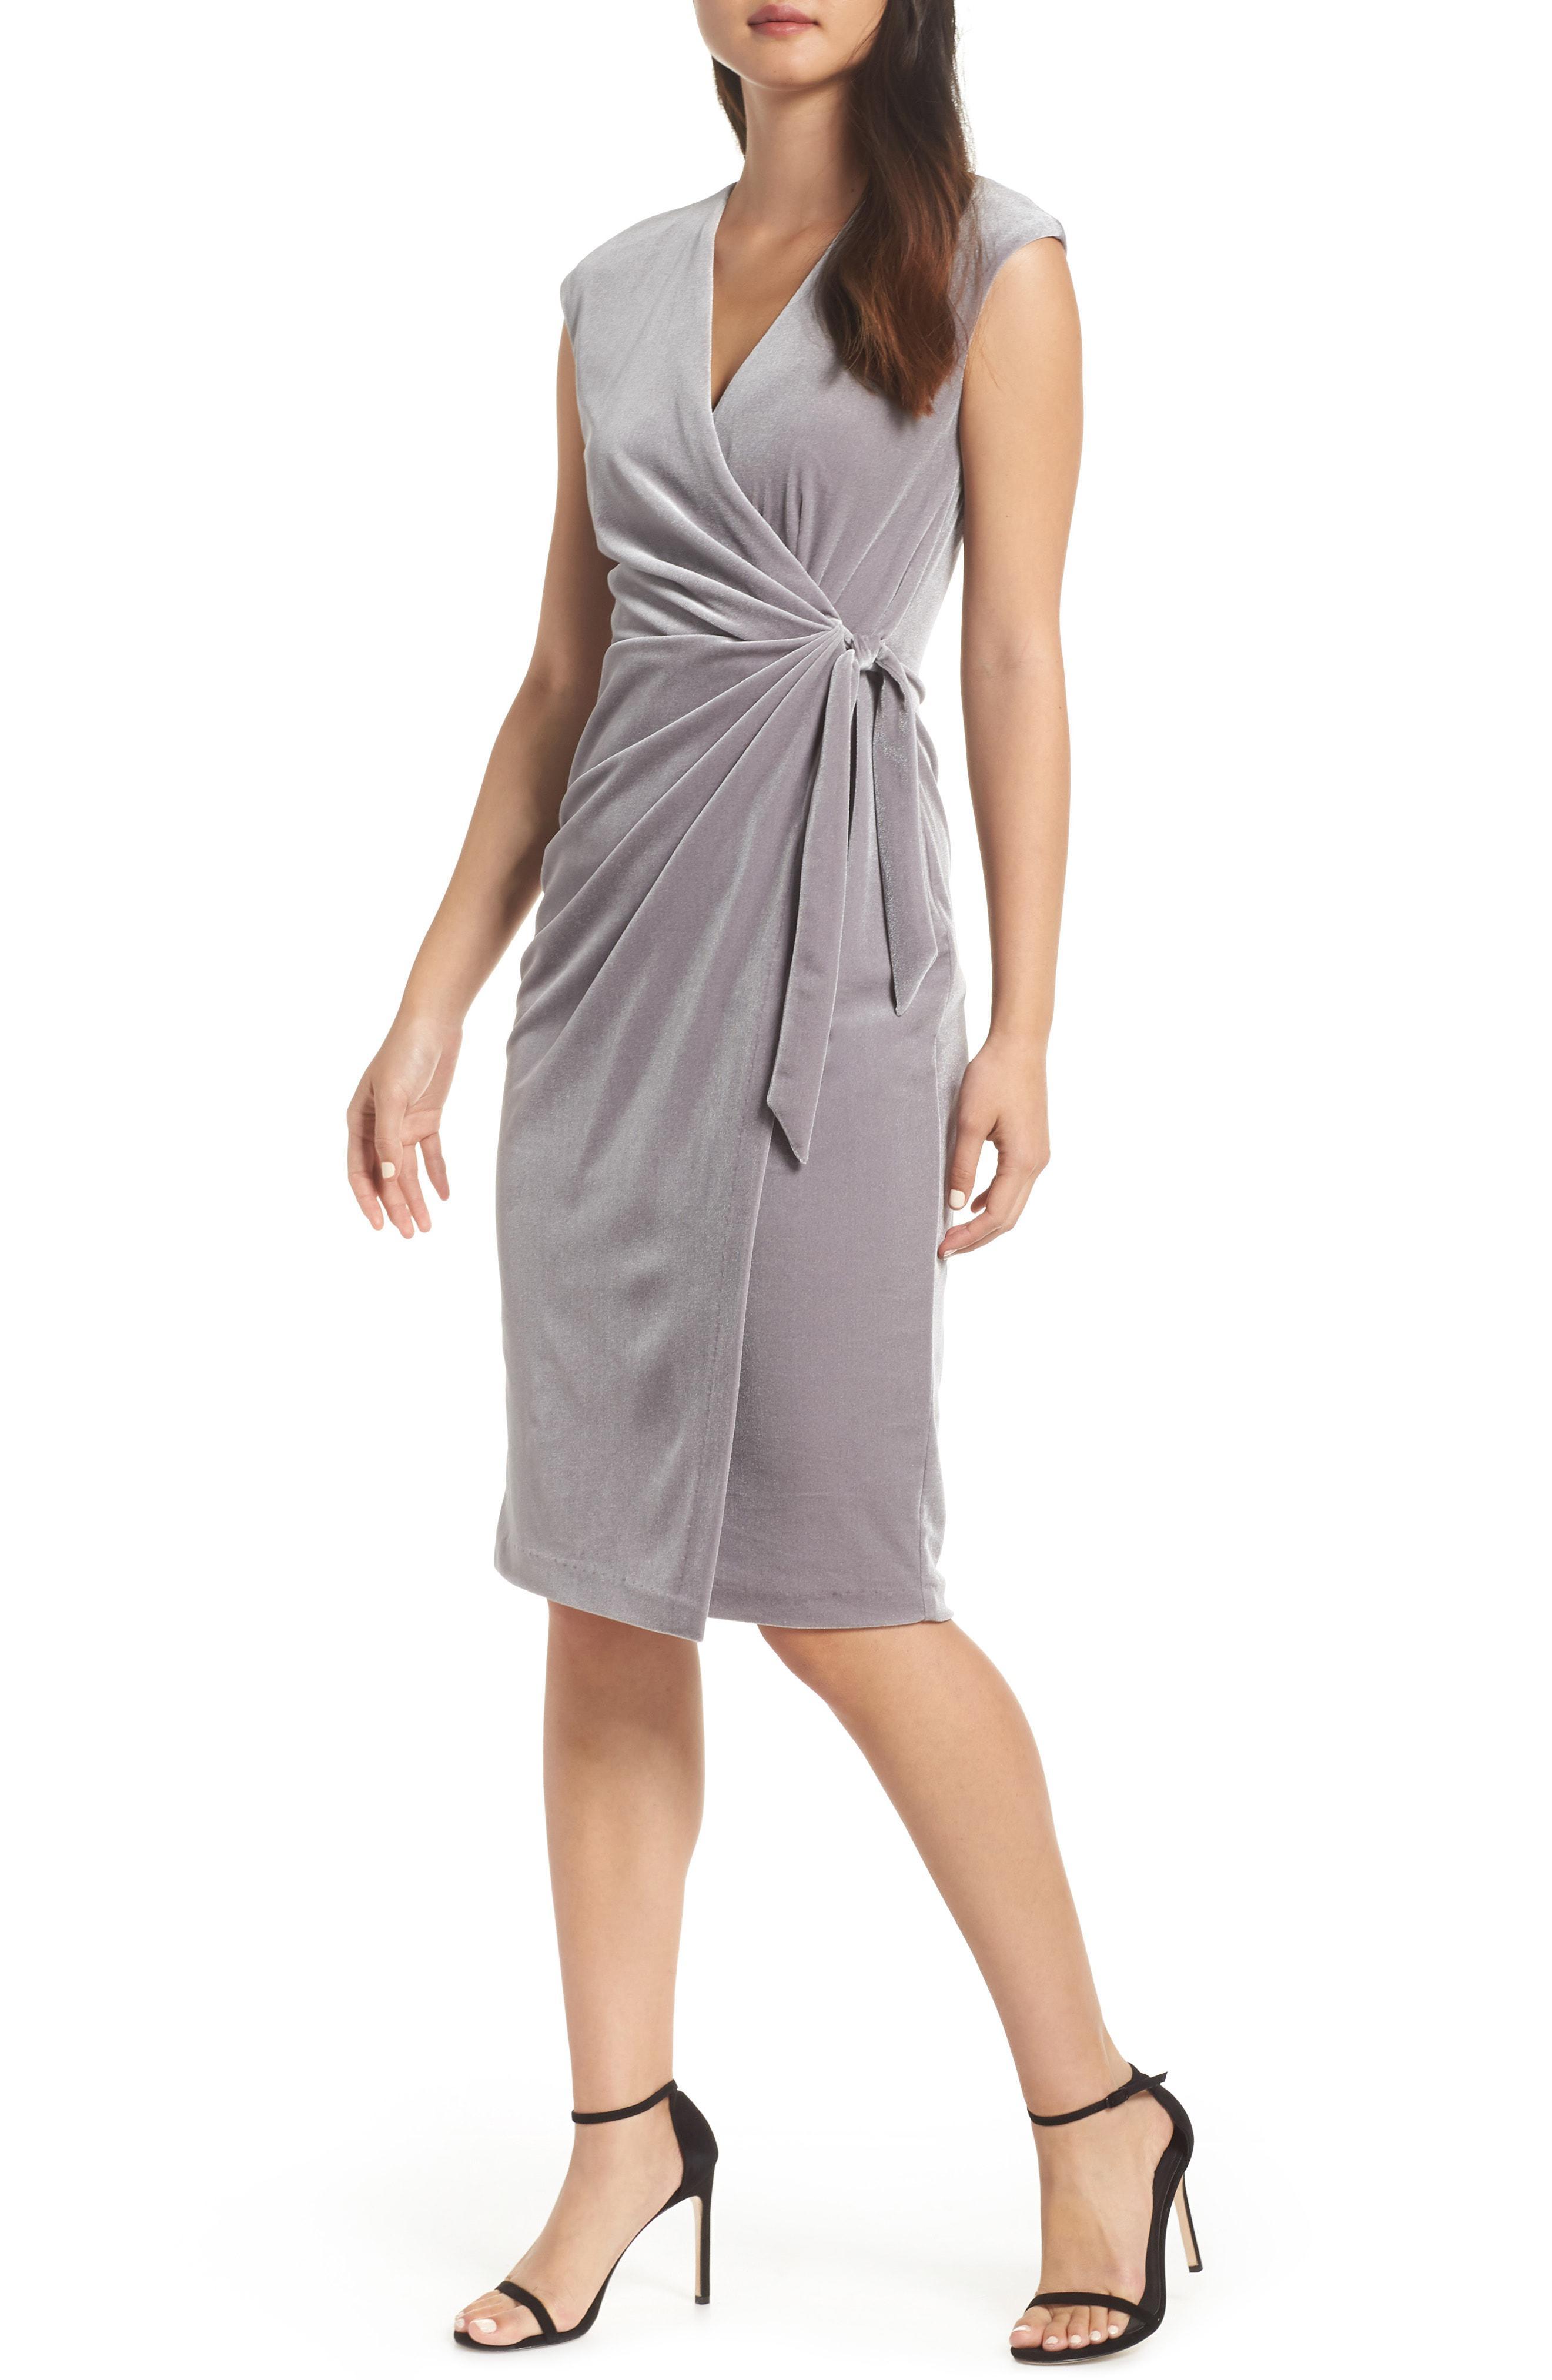 ad2a9933bdf Maggy London. Women s Velvet Faux Wrap Dress